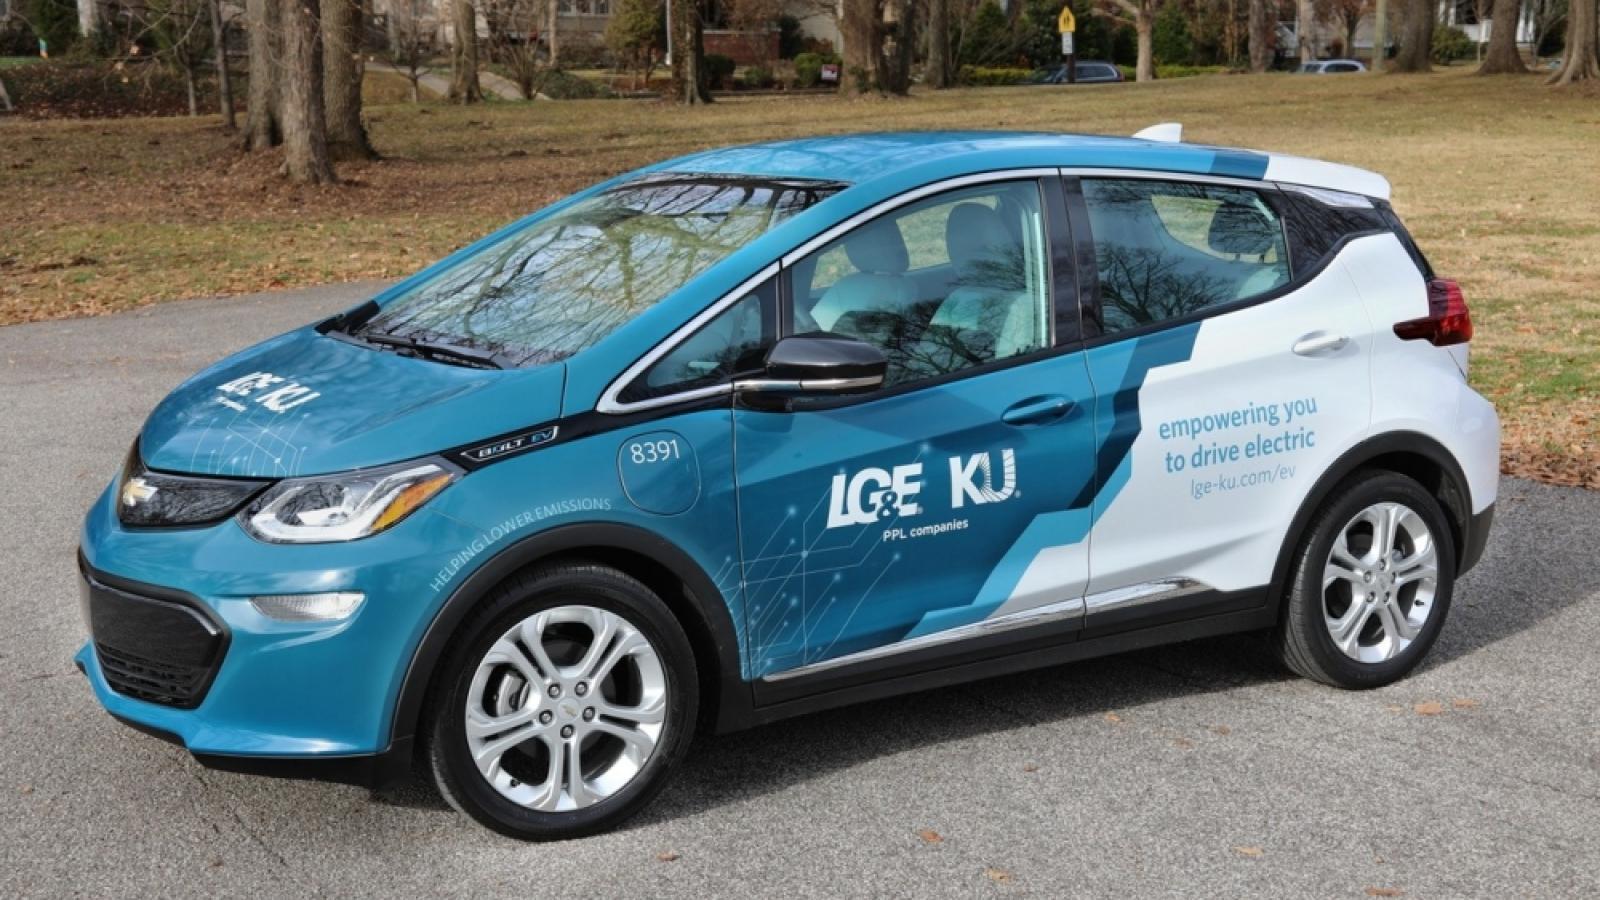 a vinyl wrapped LG&E and KU electric vehicle